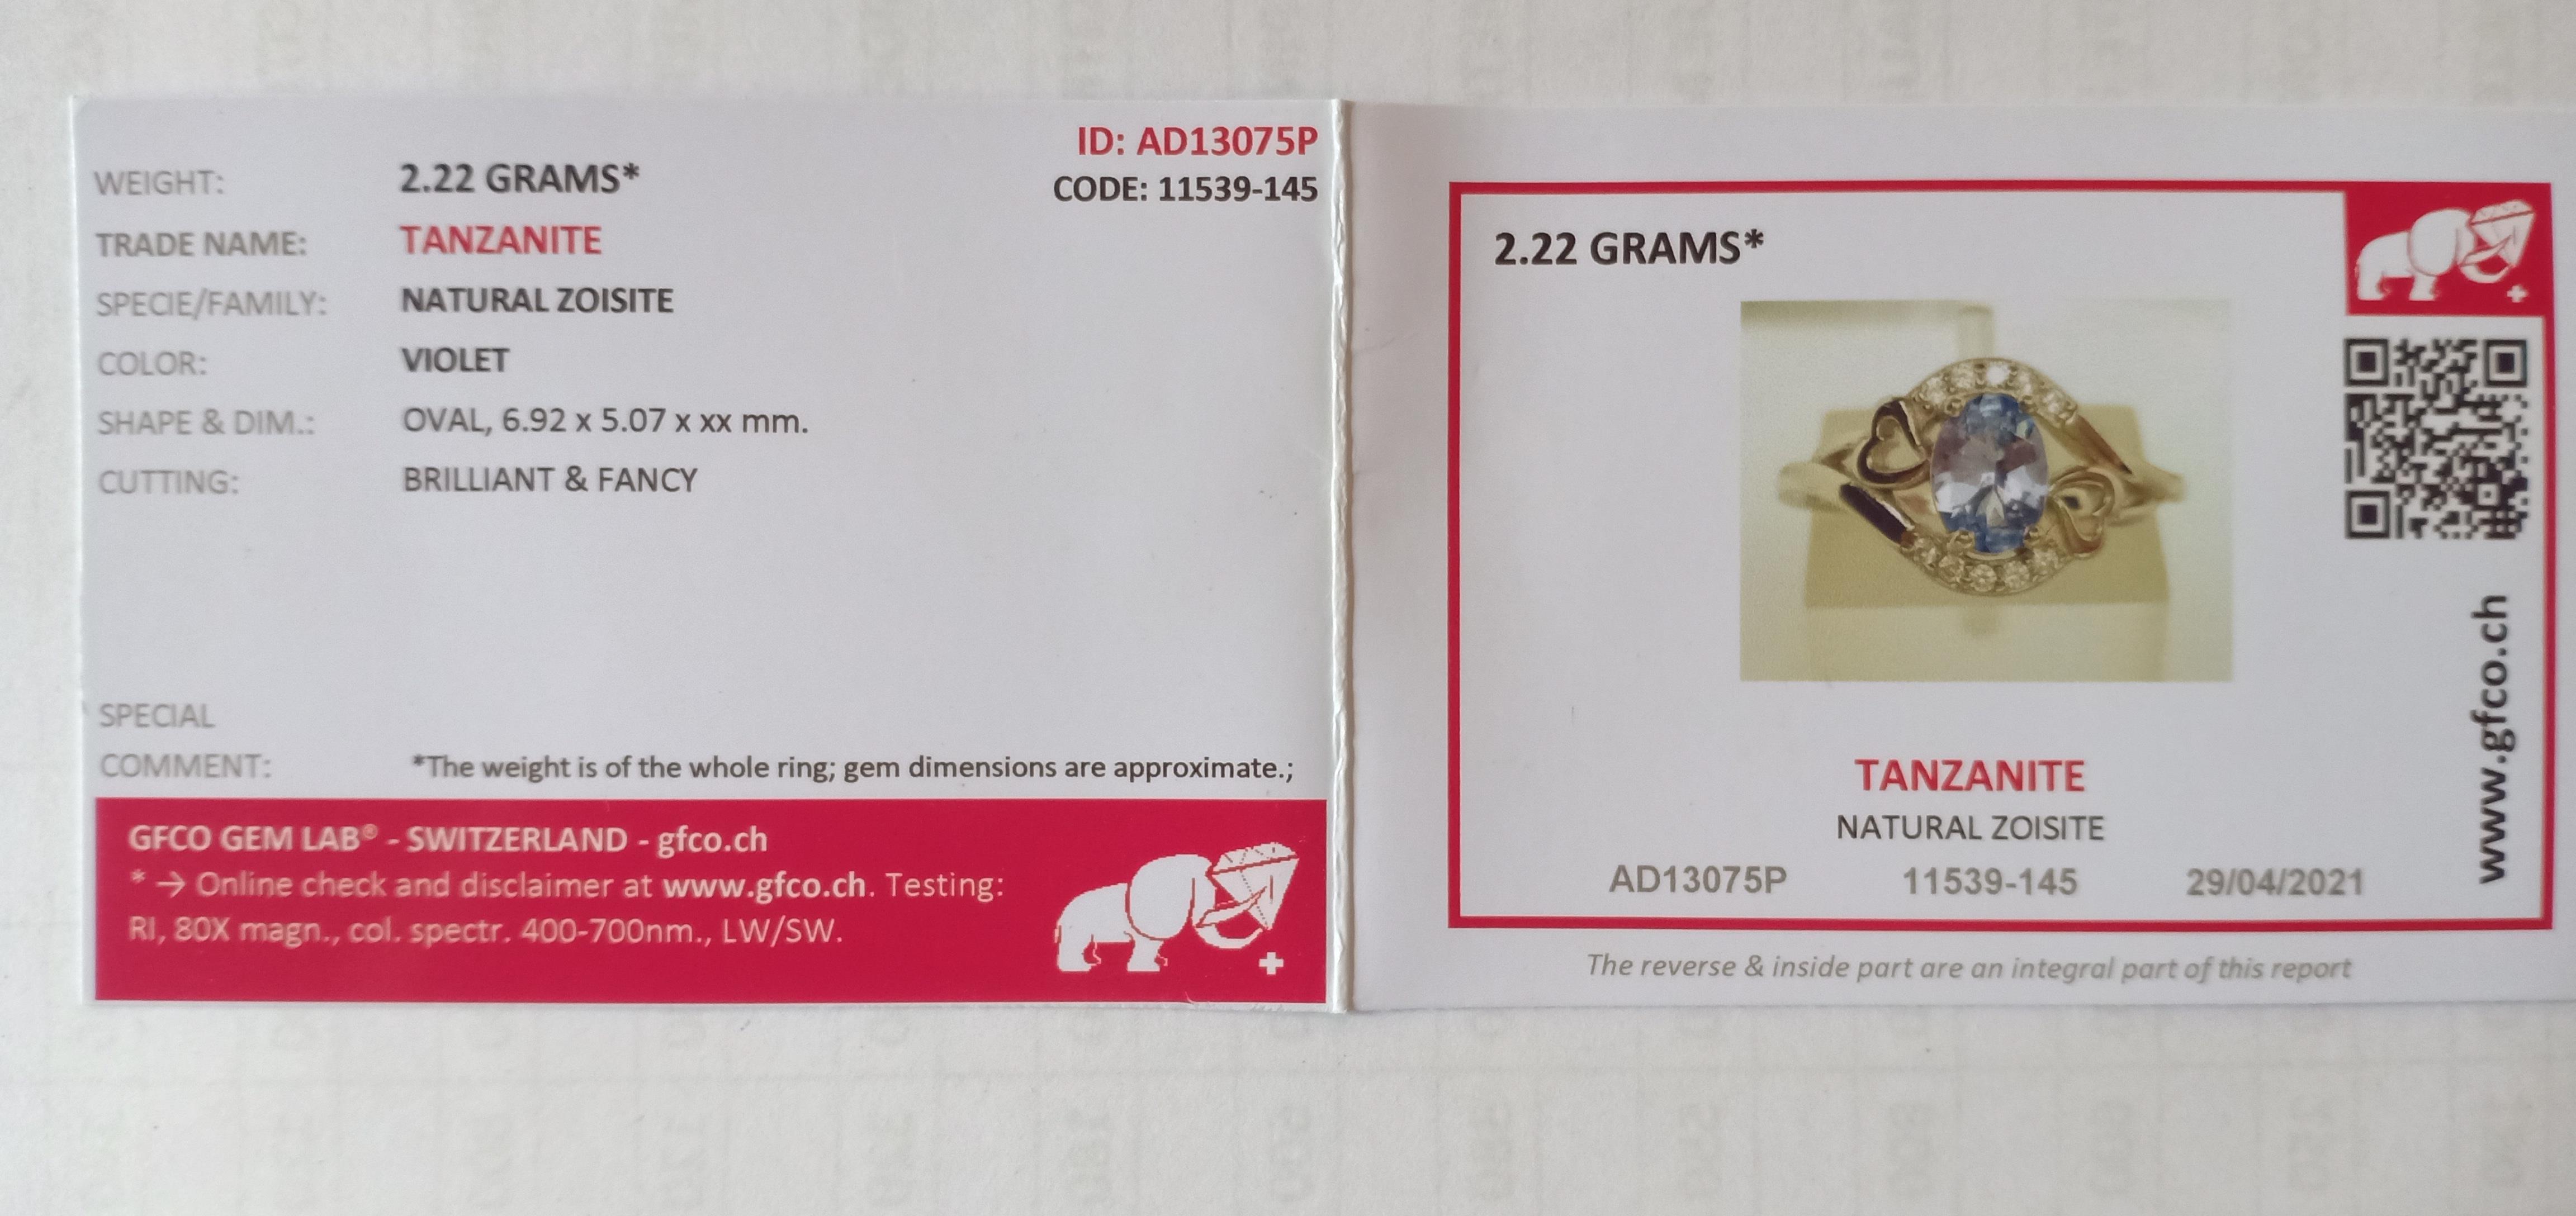 SILVER 925 RING with NATURAL TANZANITE - 2.22 Grams - TANZANIA - Certificate GFCO Swiss Laboratory - Image 5 of 5